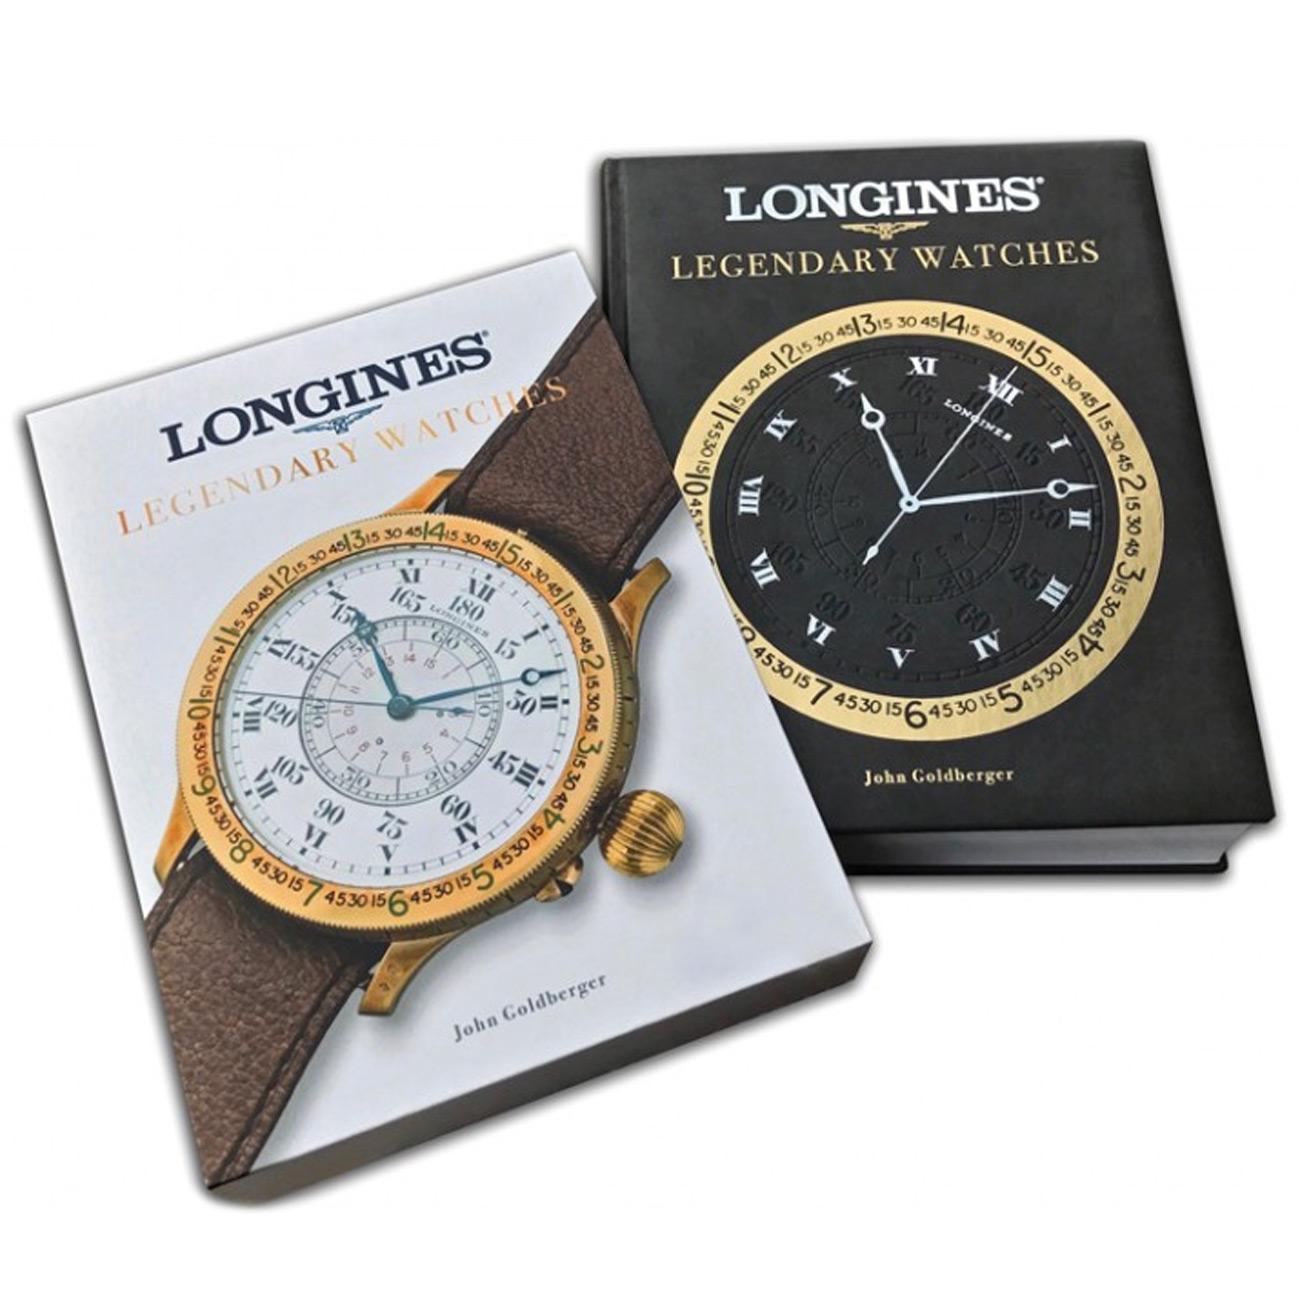 Longines Legendary Watches